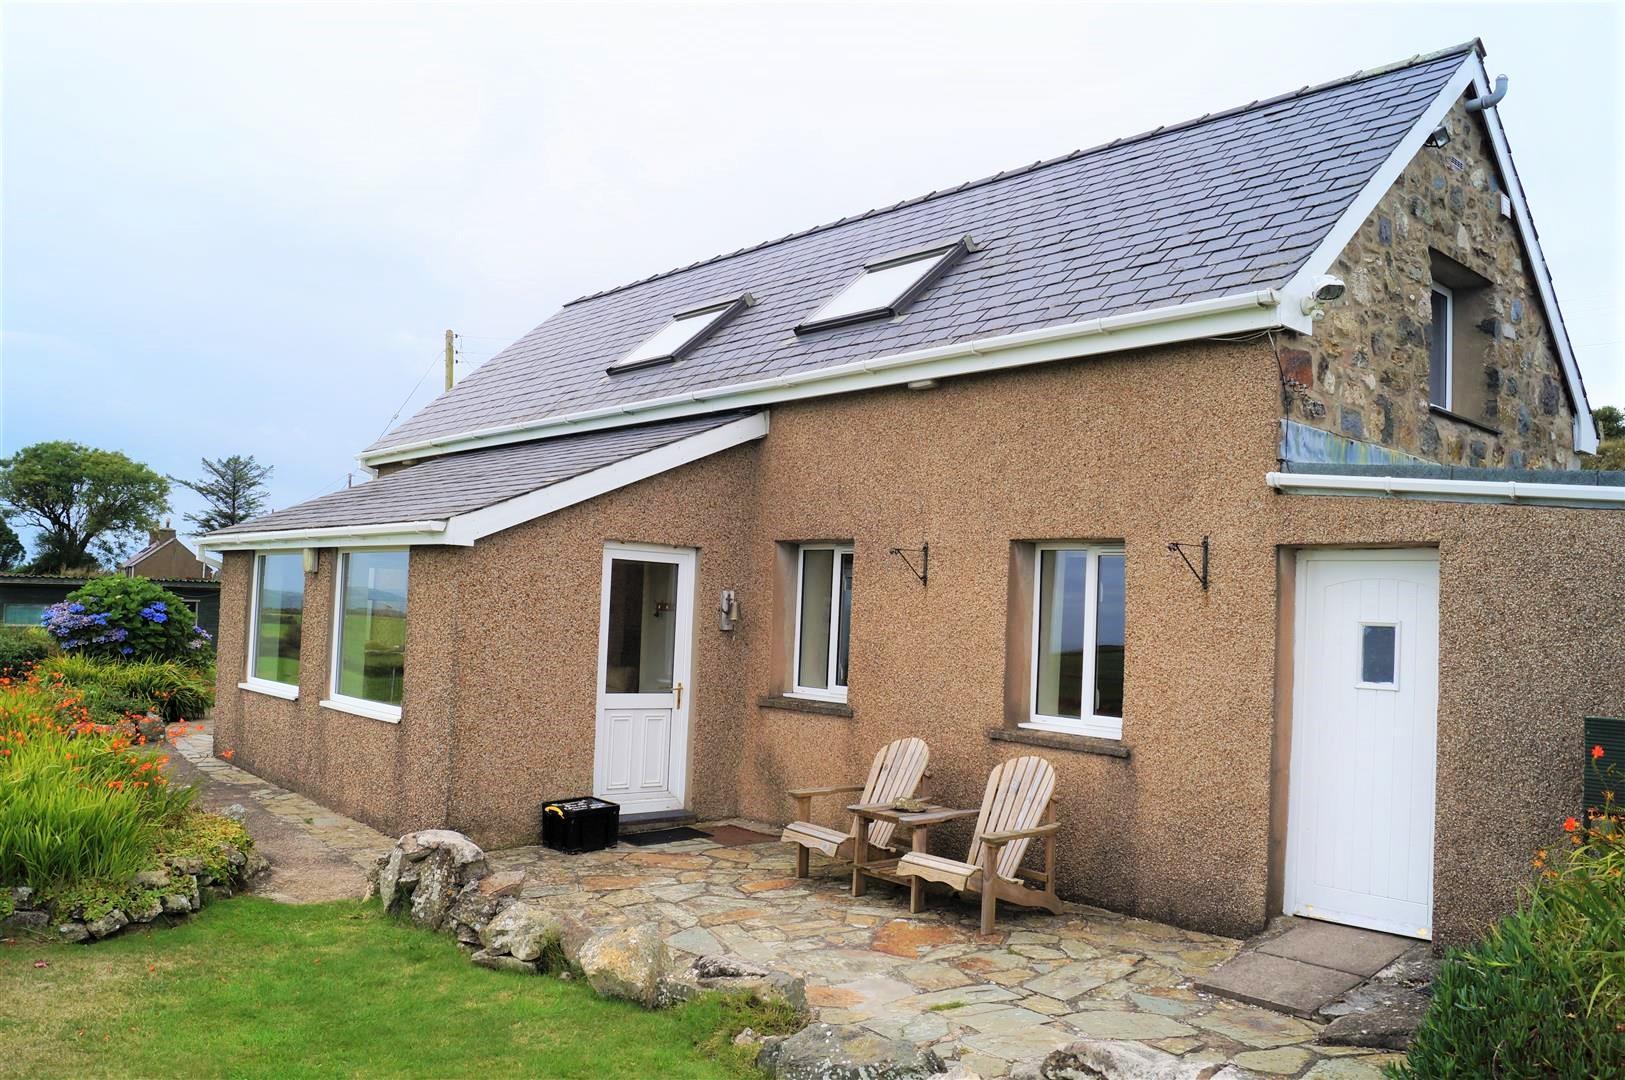 Garnfadryn - £265,000